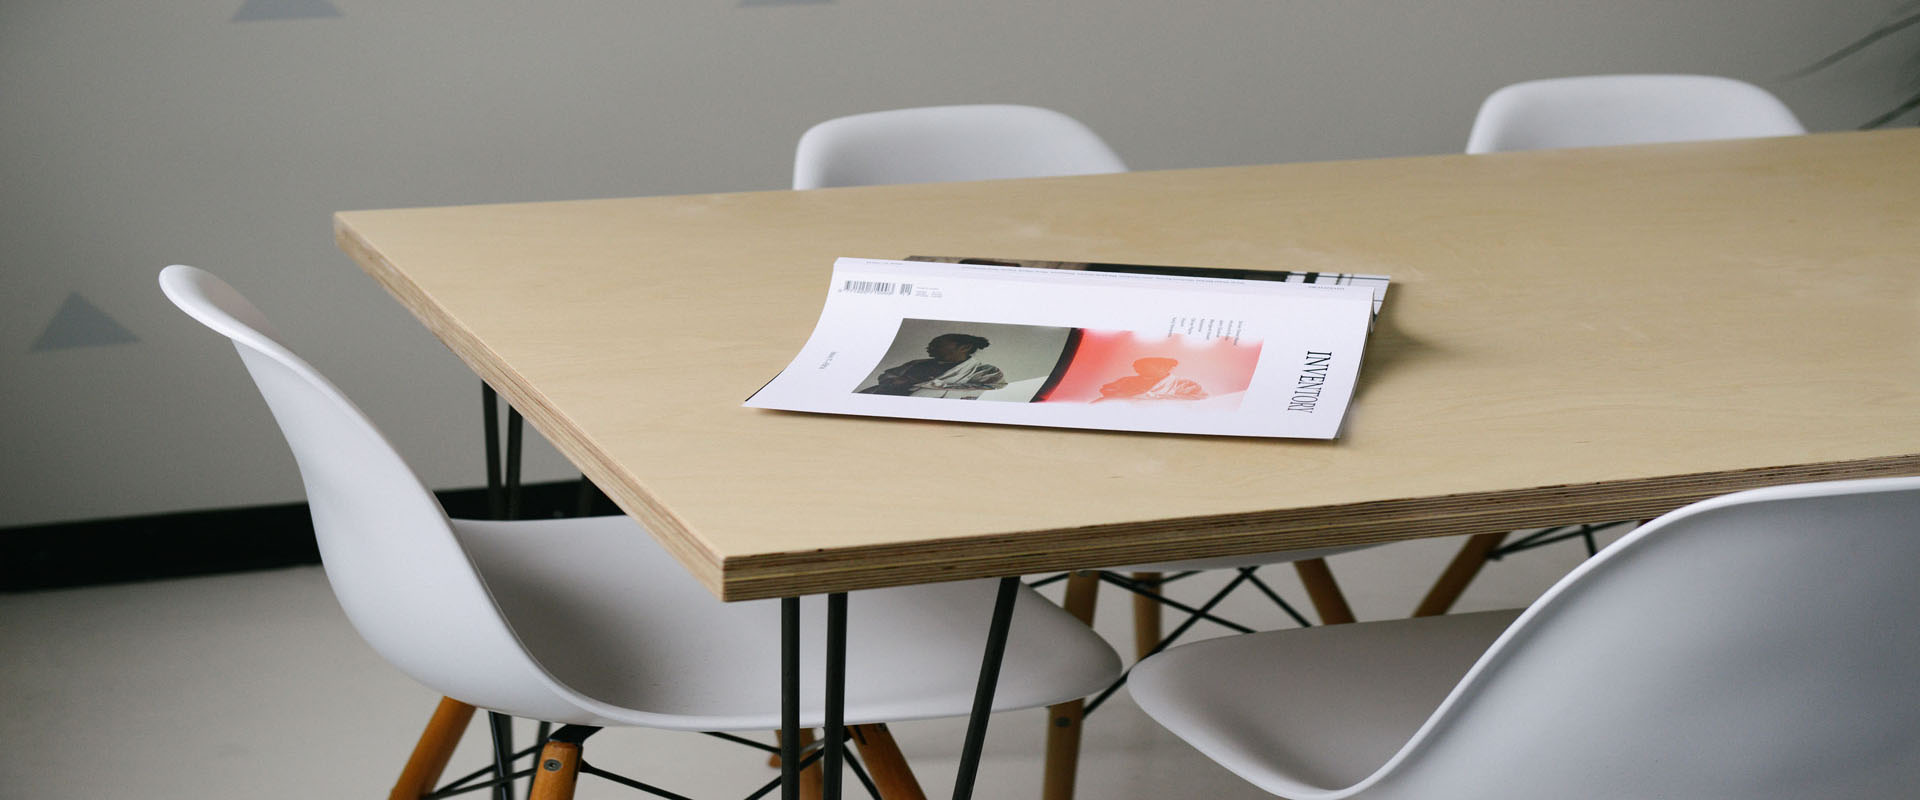 Nordic Furniture Insight